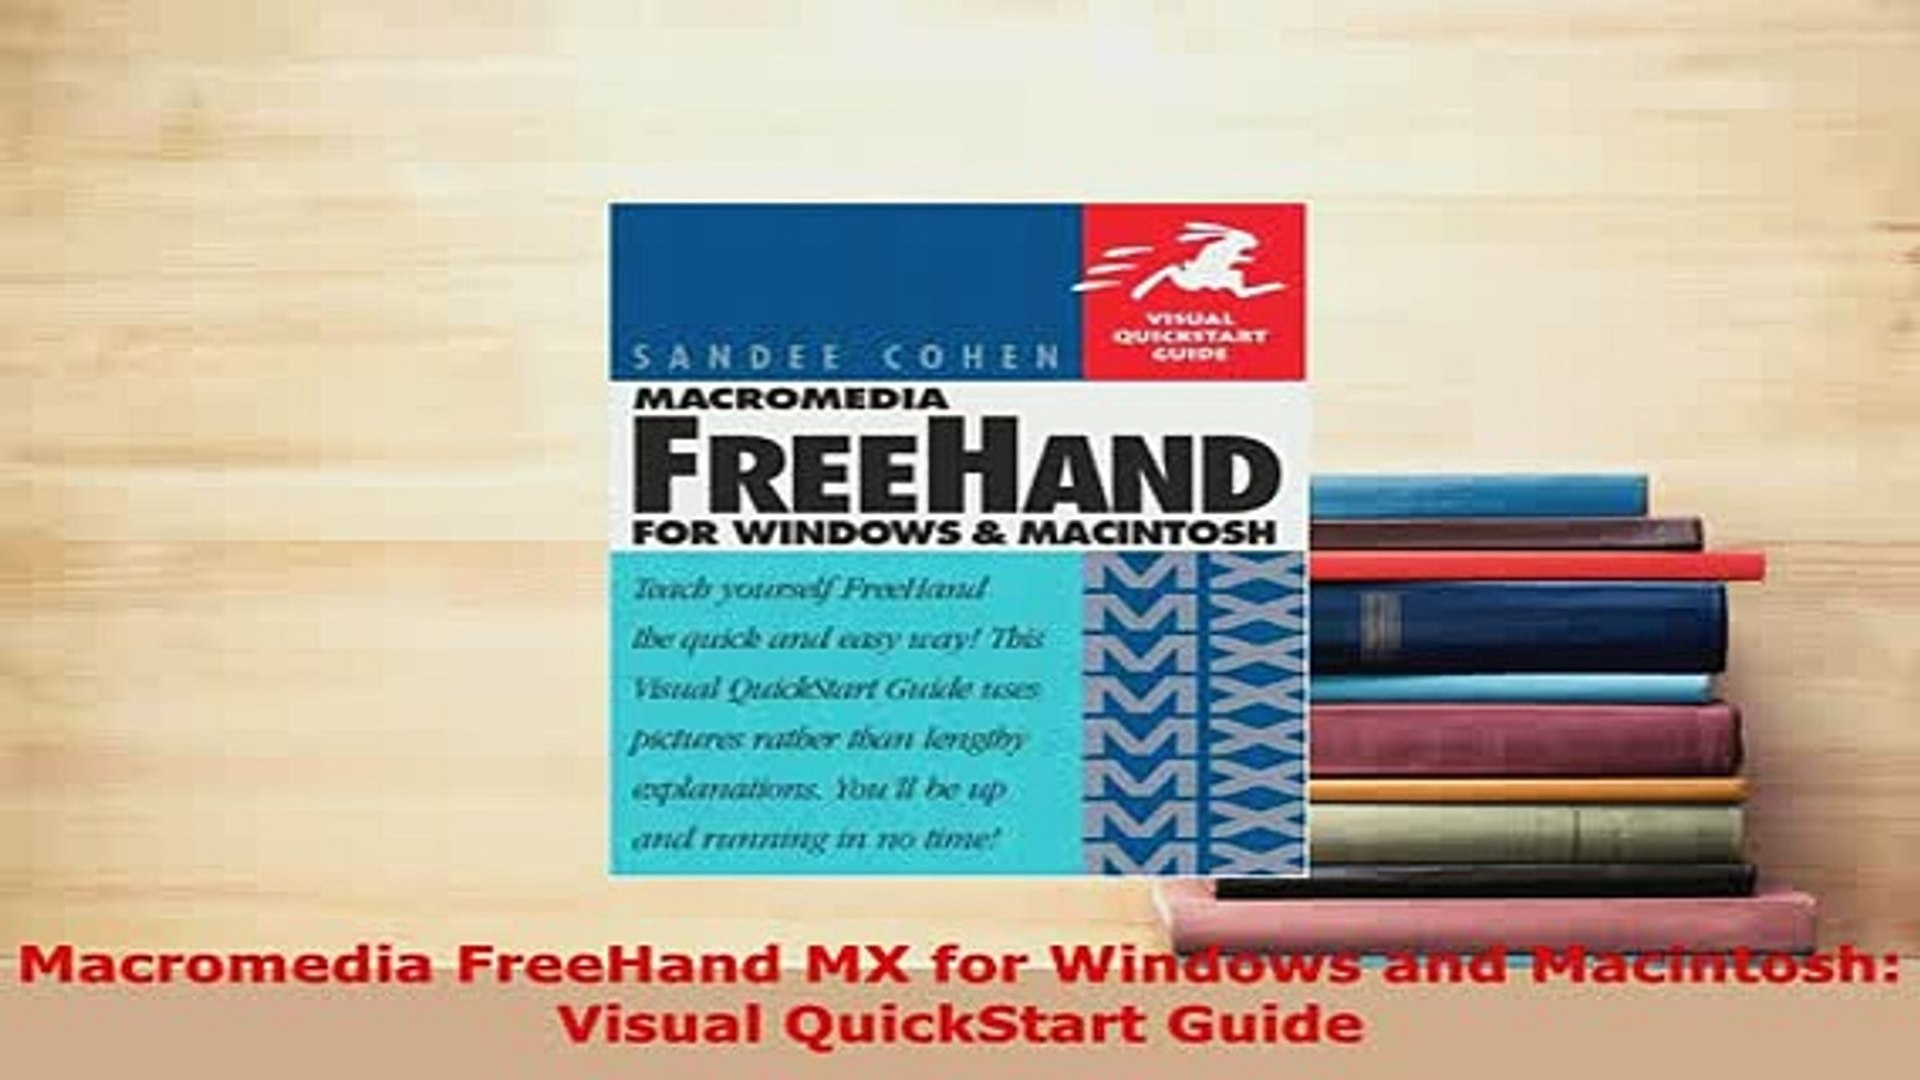 macromedia freehand mx serial no